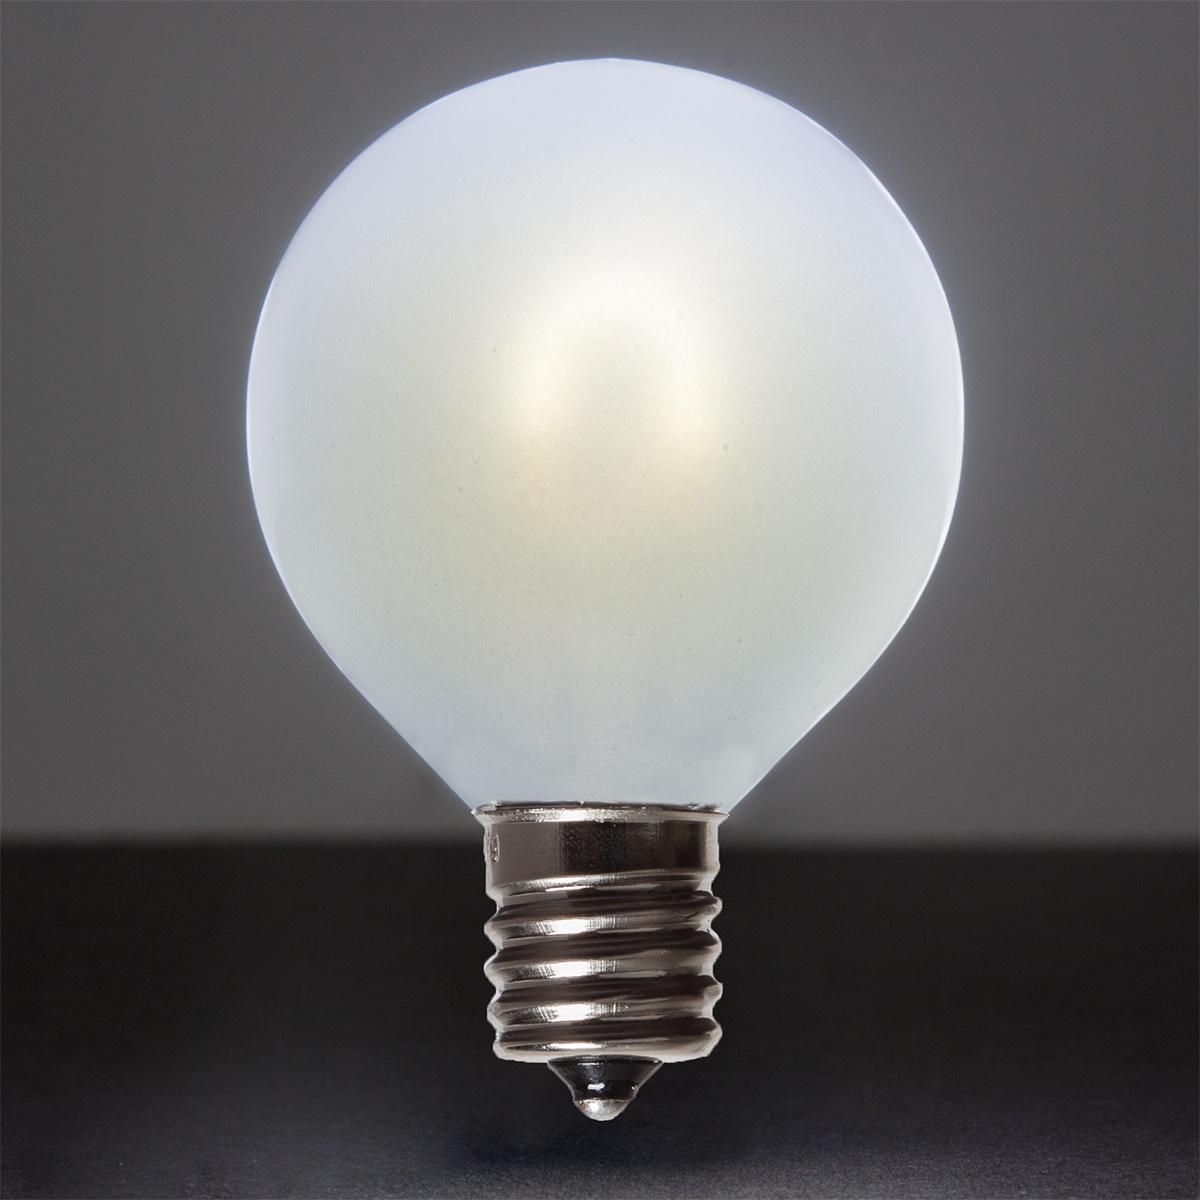 Led Bulbd: G50 Cool White Glass FlexFilament TM LED Edison Bulb, Satin